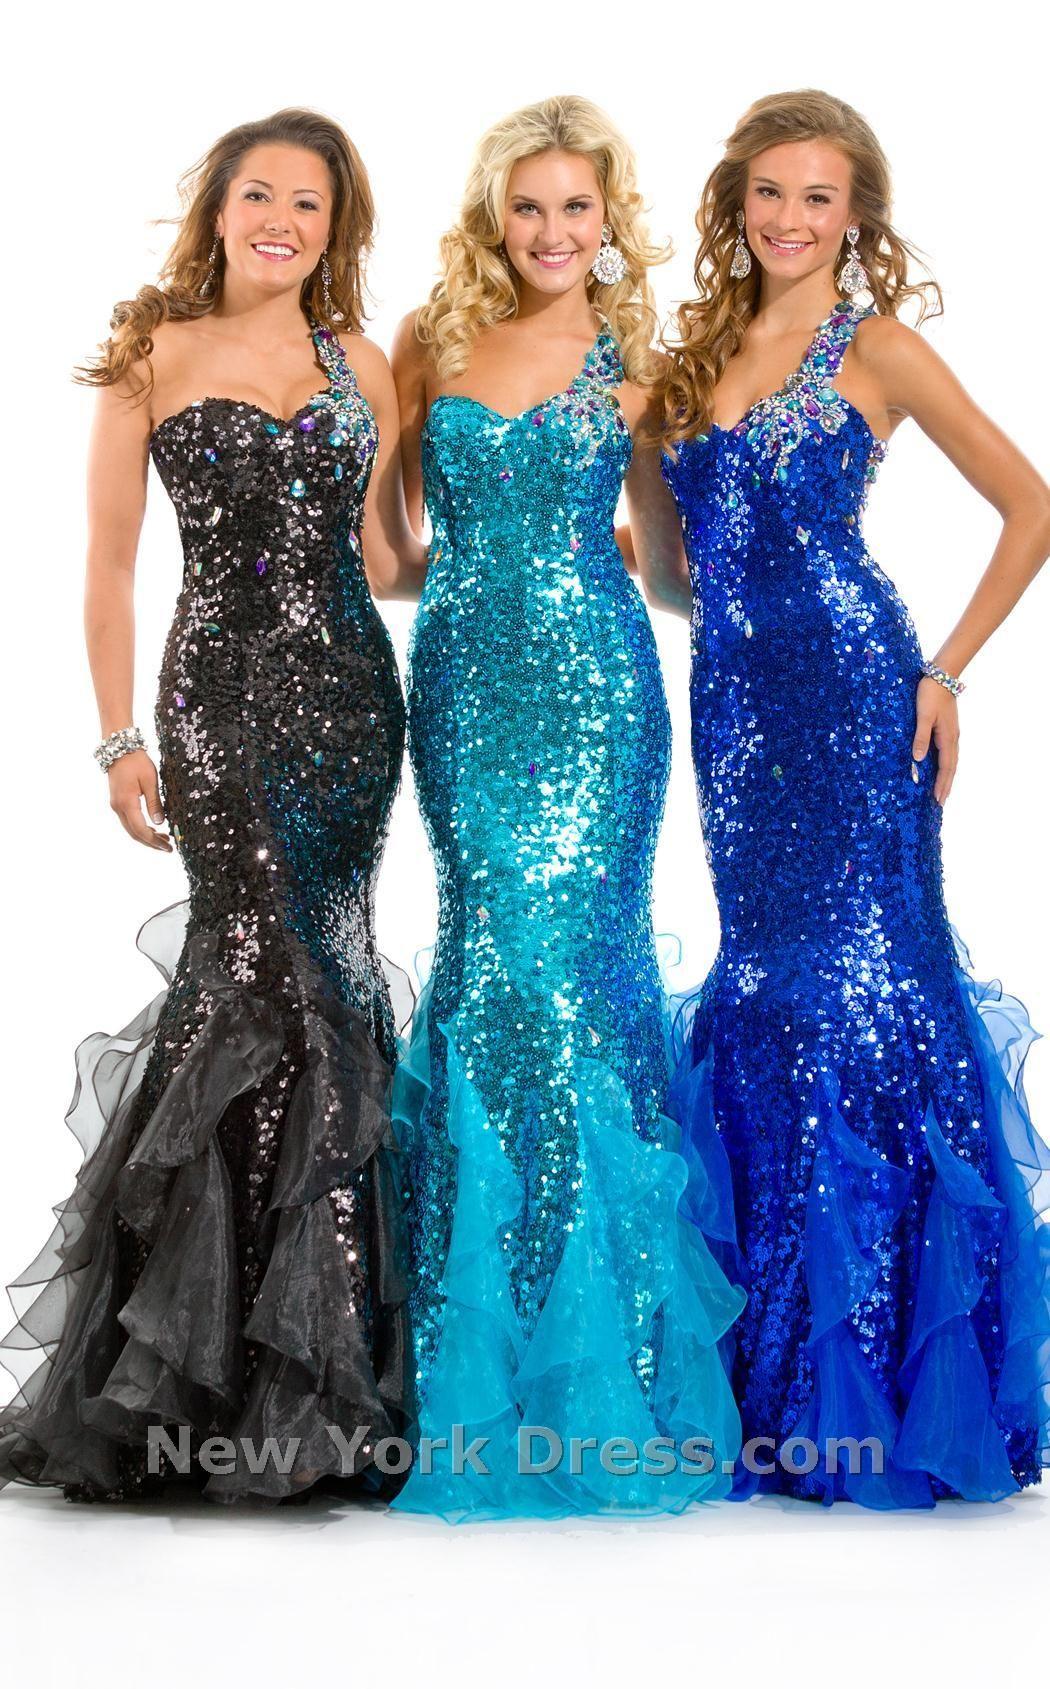 Party Time 6012 Dress. Shop NewYorkDress at NewYorkDress.com or ...